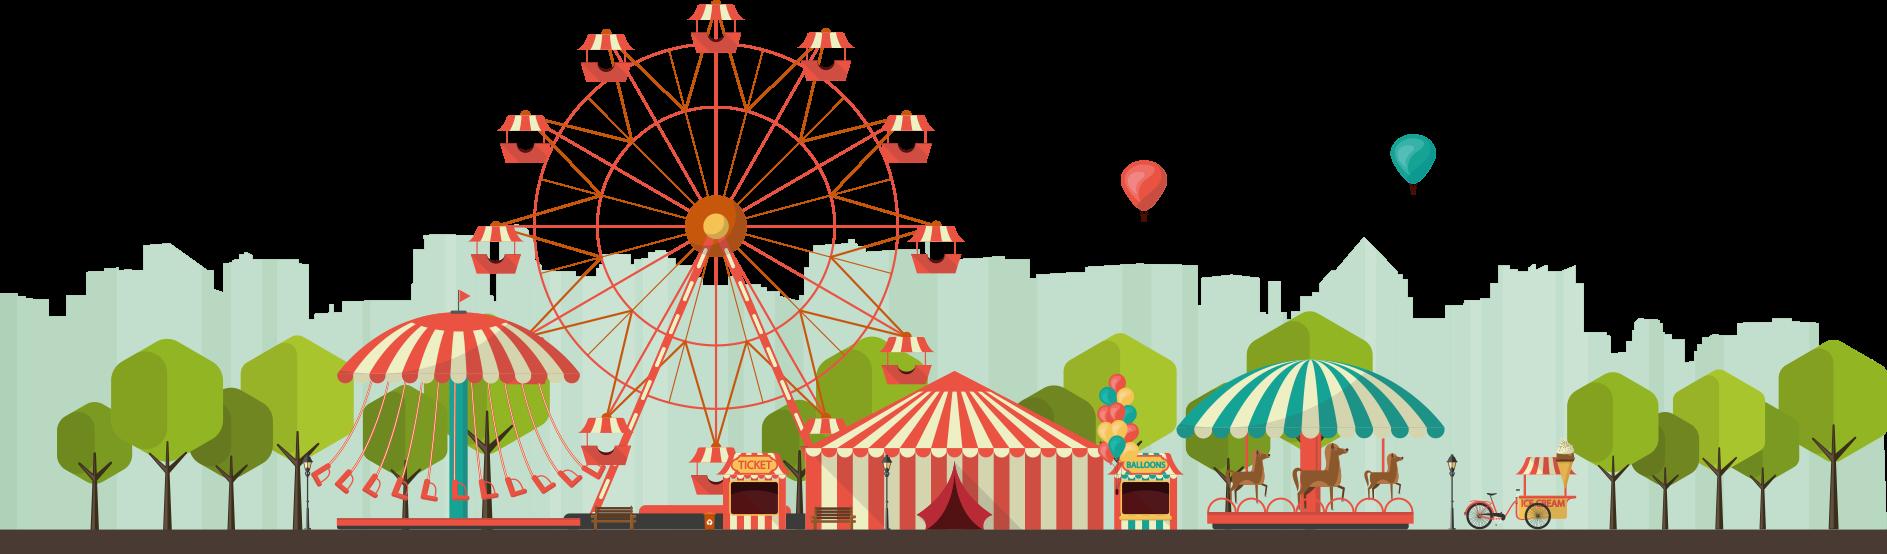 Gate clipart amusement park.  collection of png